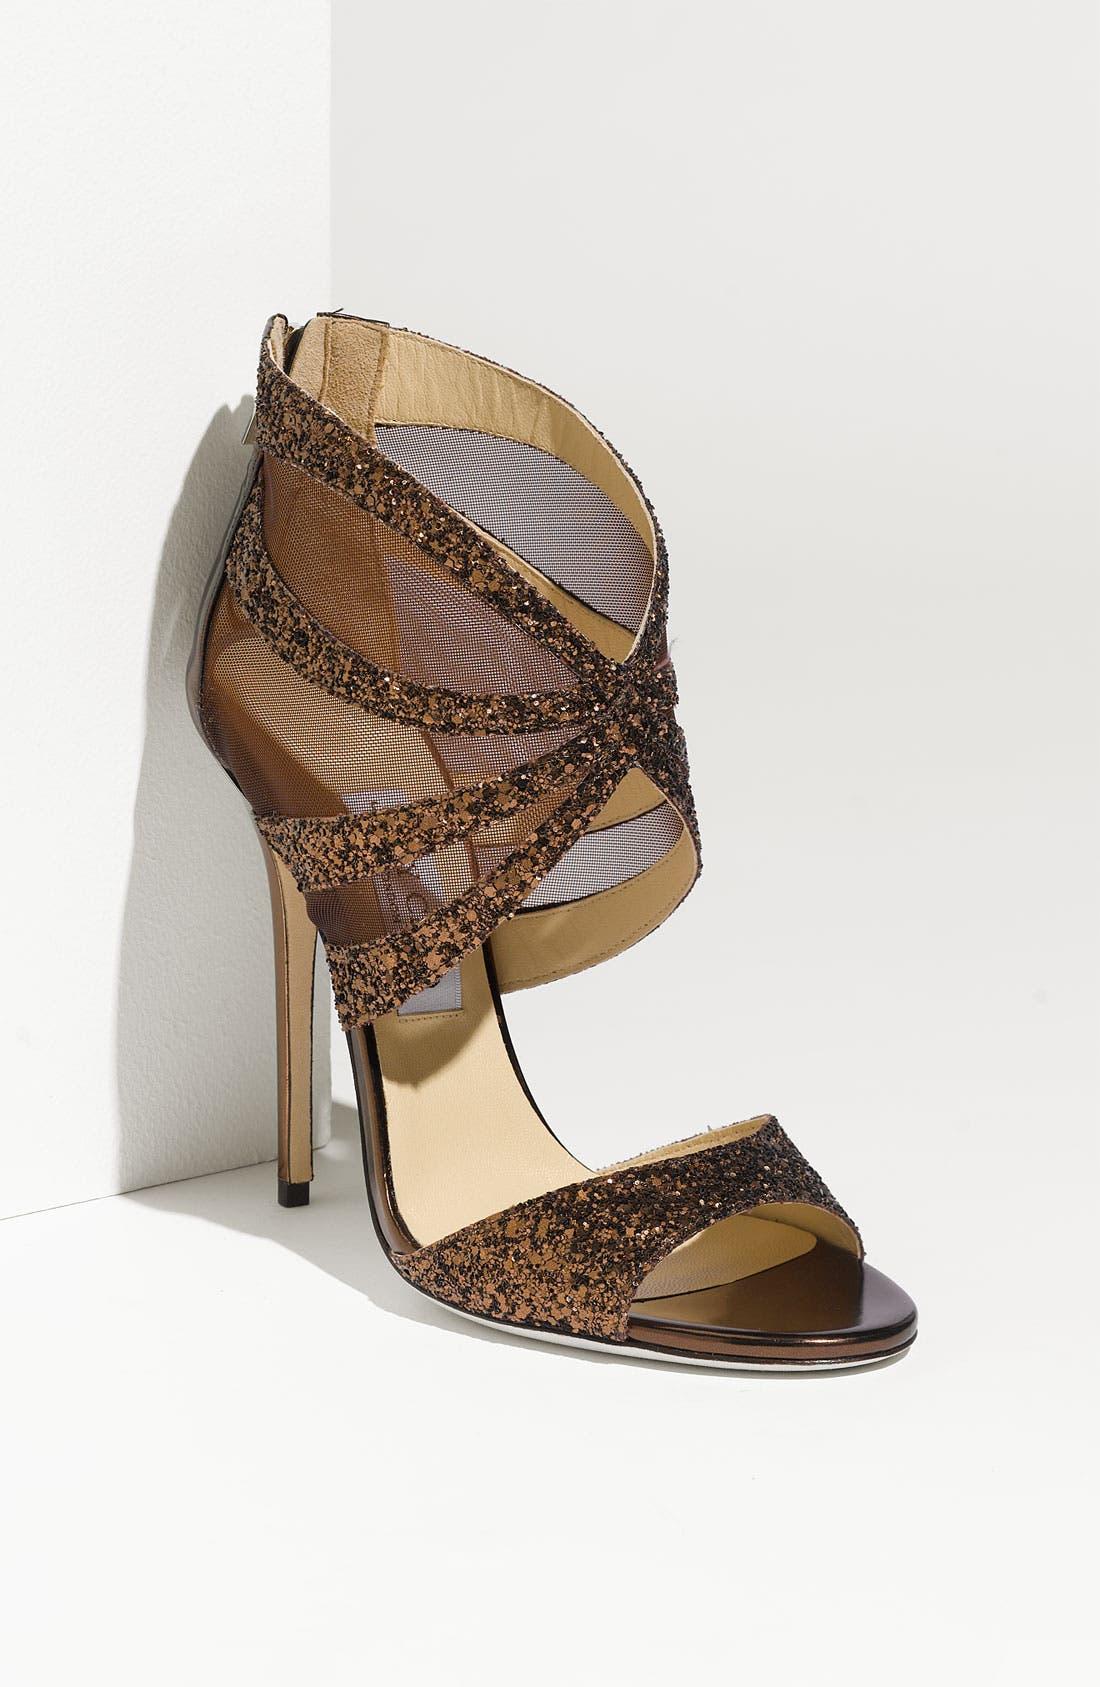 Alternate Image 1 Selected - Jimmy Choo 'Leila' Mesh Sandal